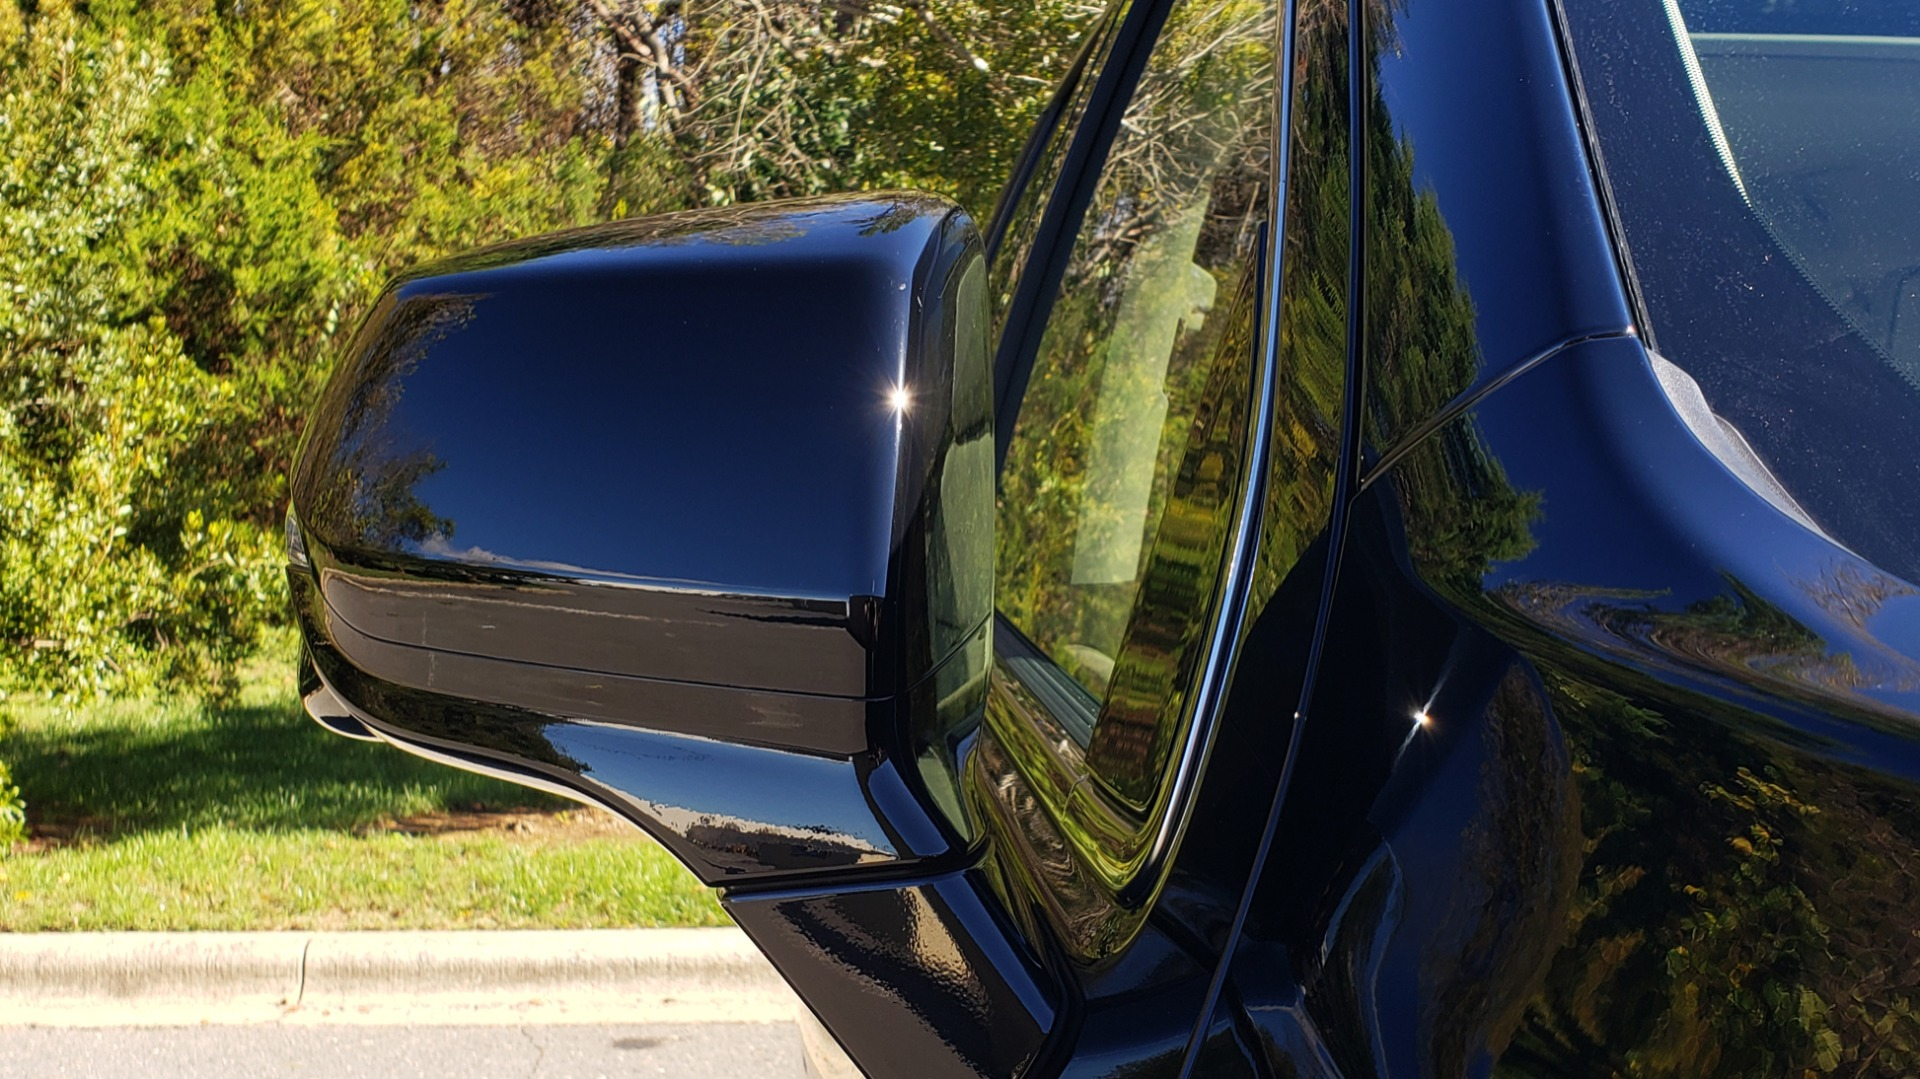 Used 2021 GMC YUKON DENALI PREMIUM 4WD / NAV / ADVANCED TECH / ENTERTAINMENT for sale Sold at Formula Imports in Charlotte NC 28227 26